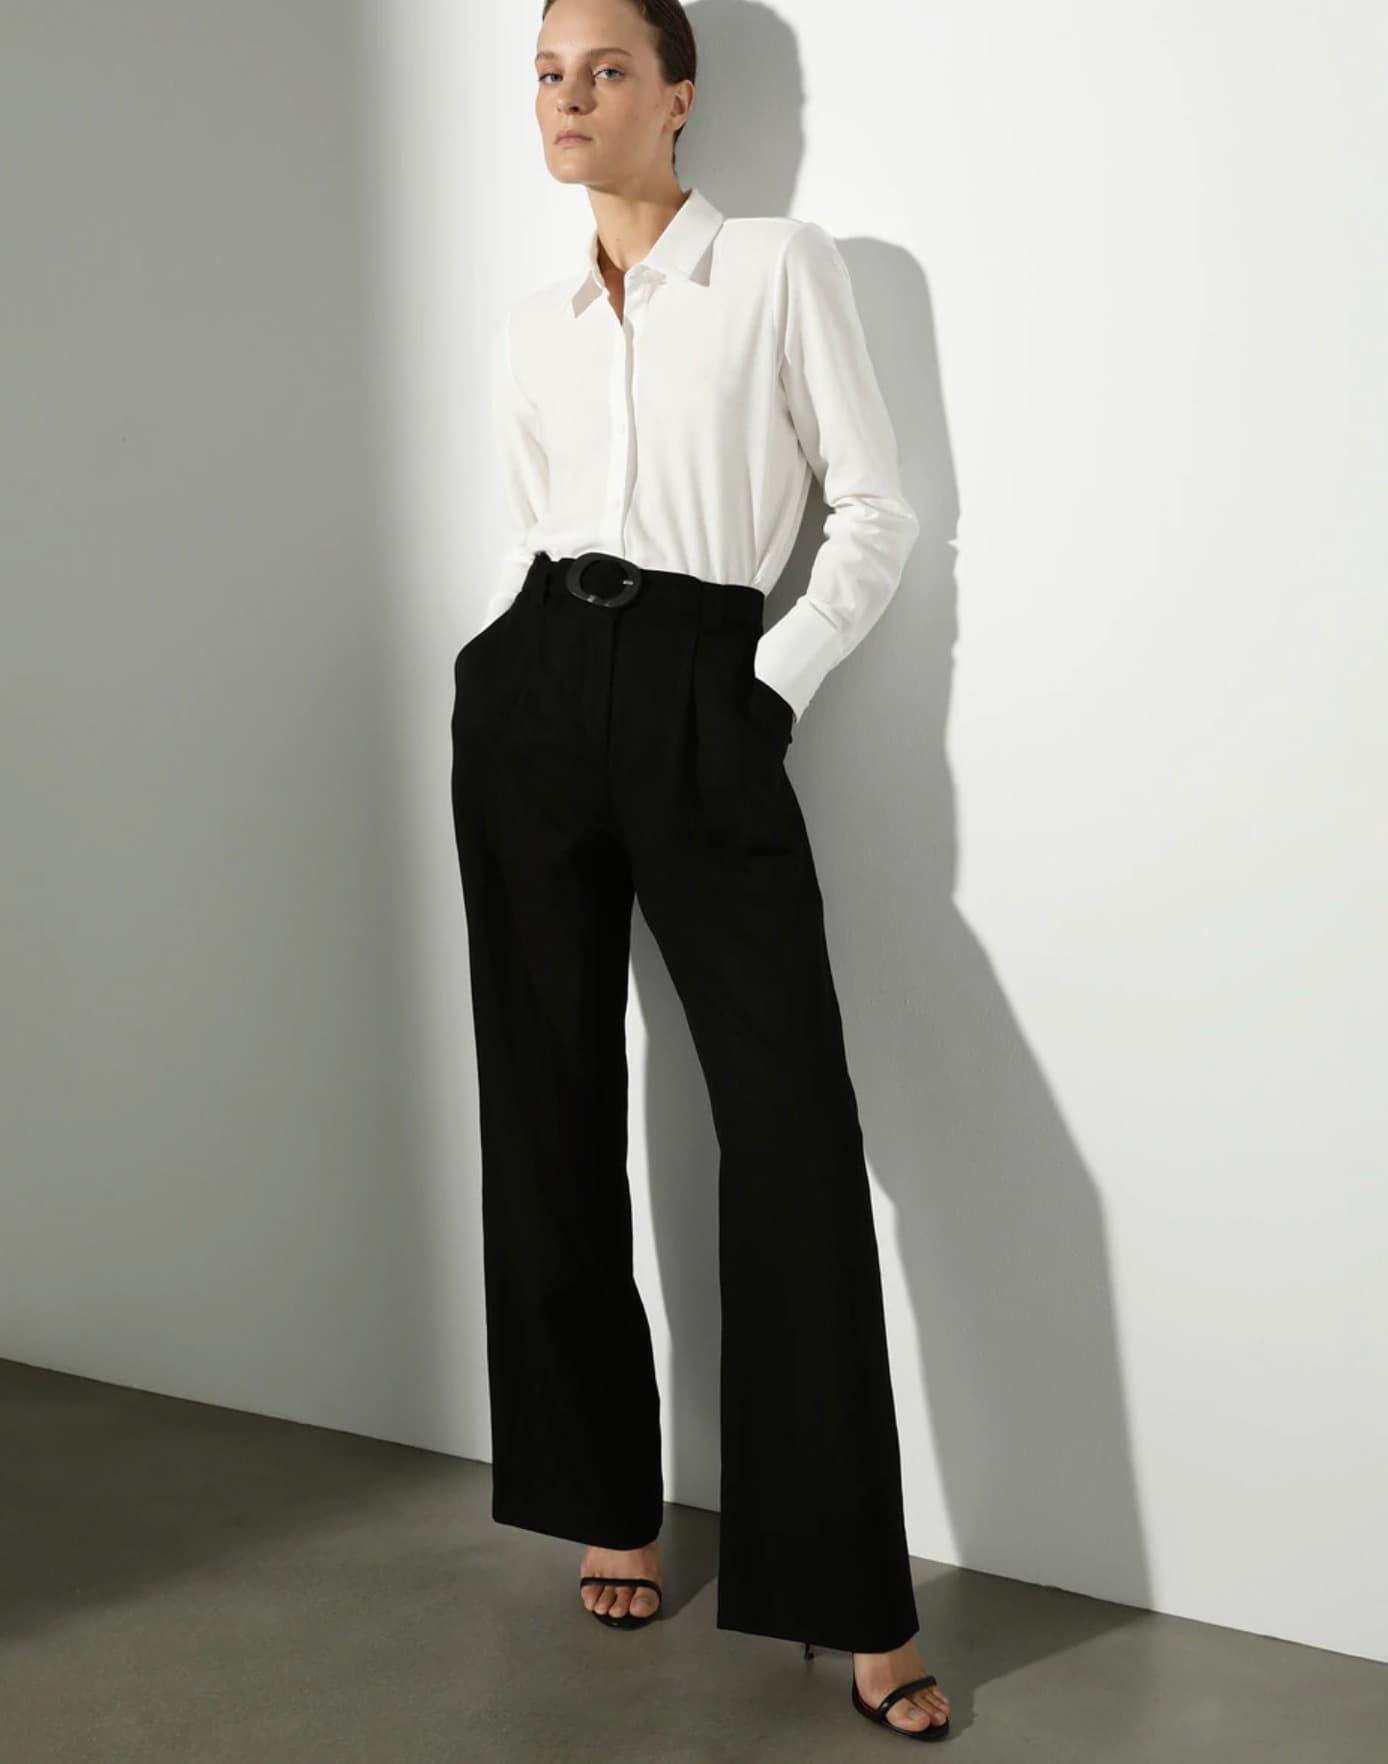 Pantalón amplio de mujer con lino